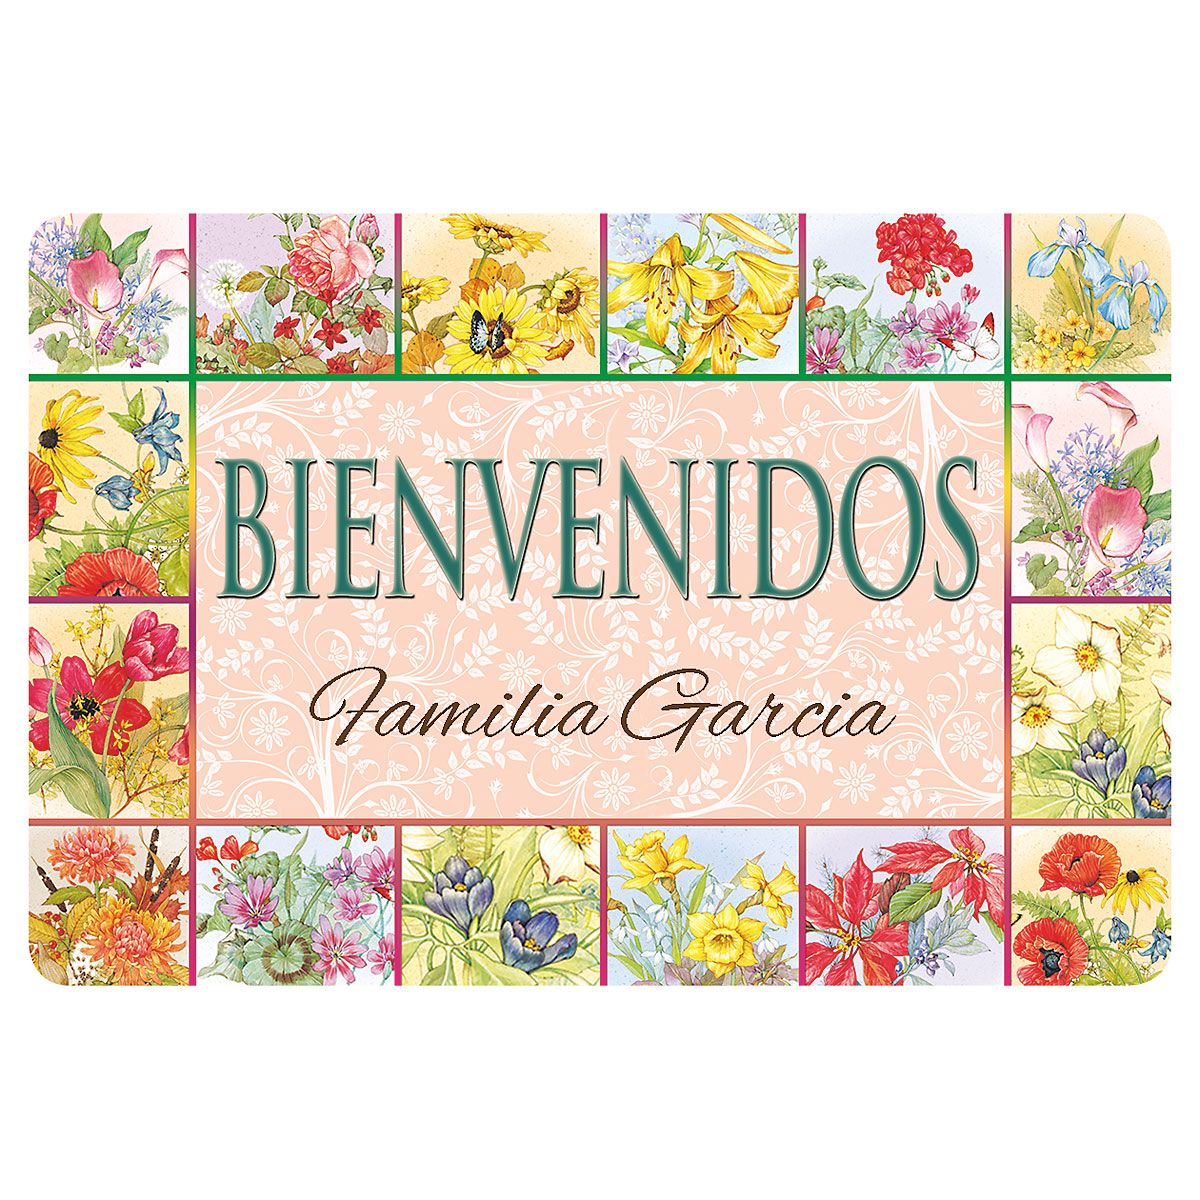 Floral Bienvenidos Personalized Welcome Doormat